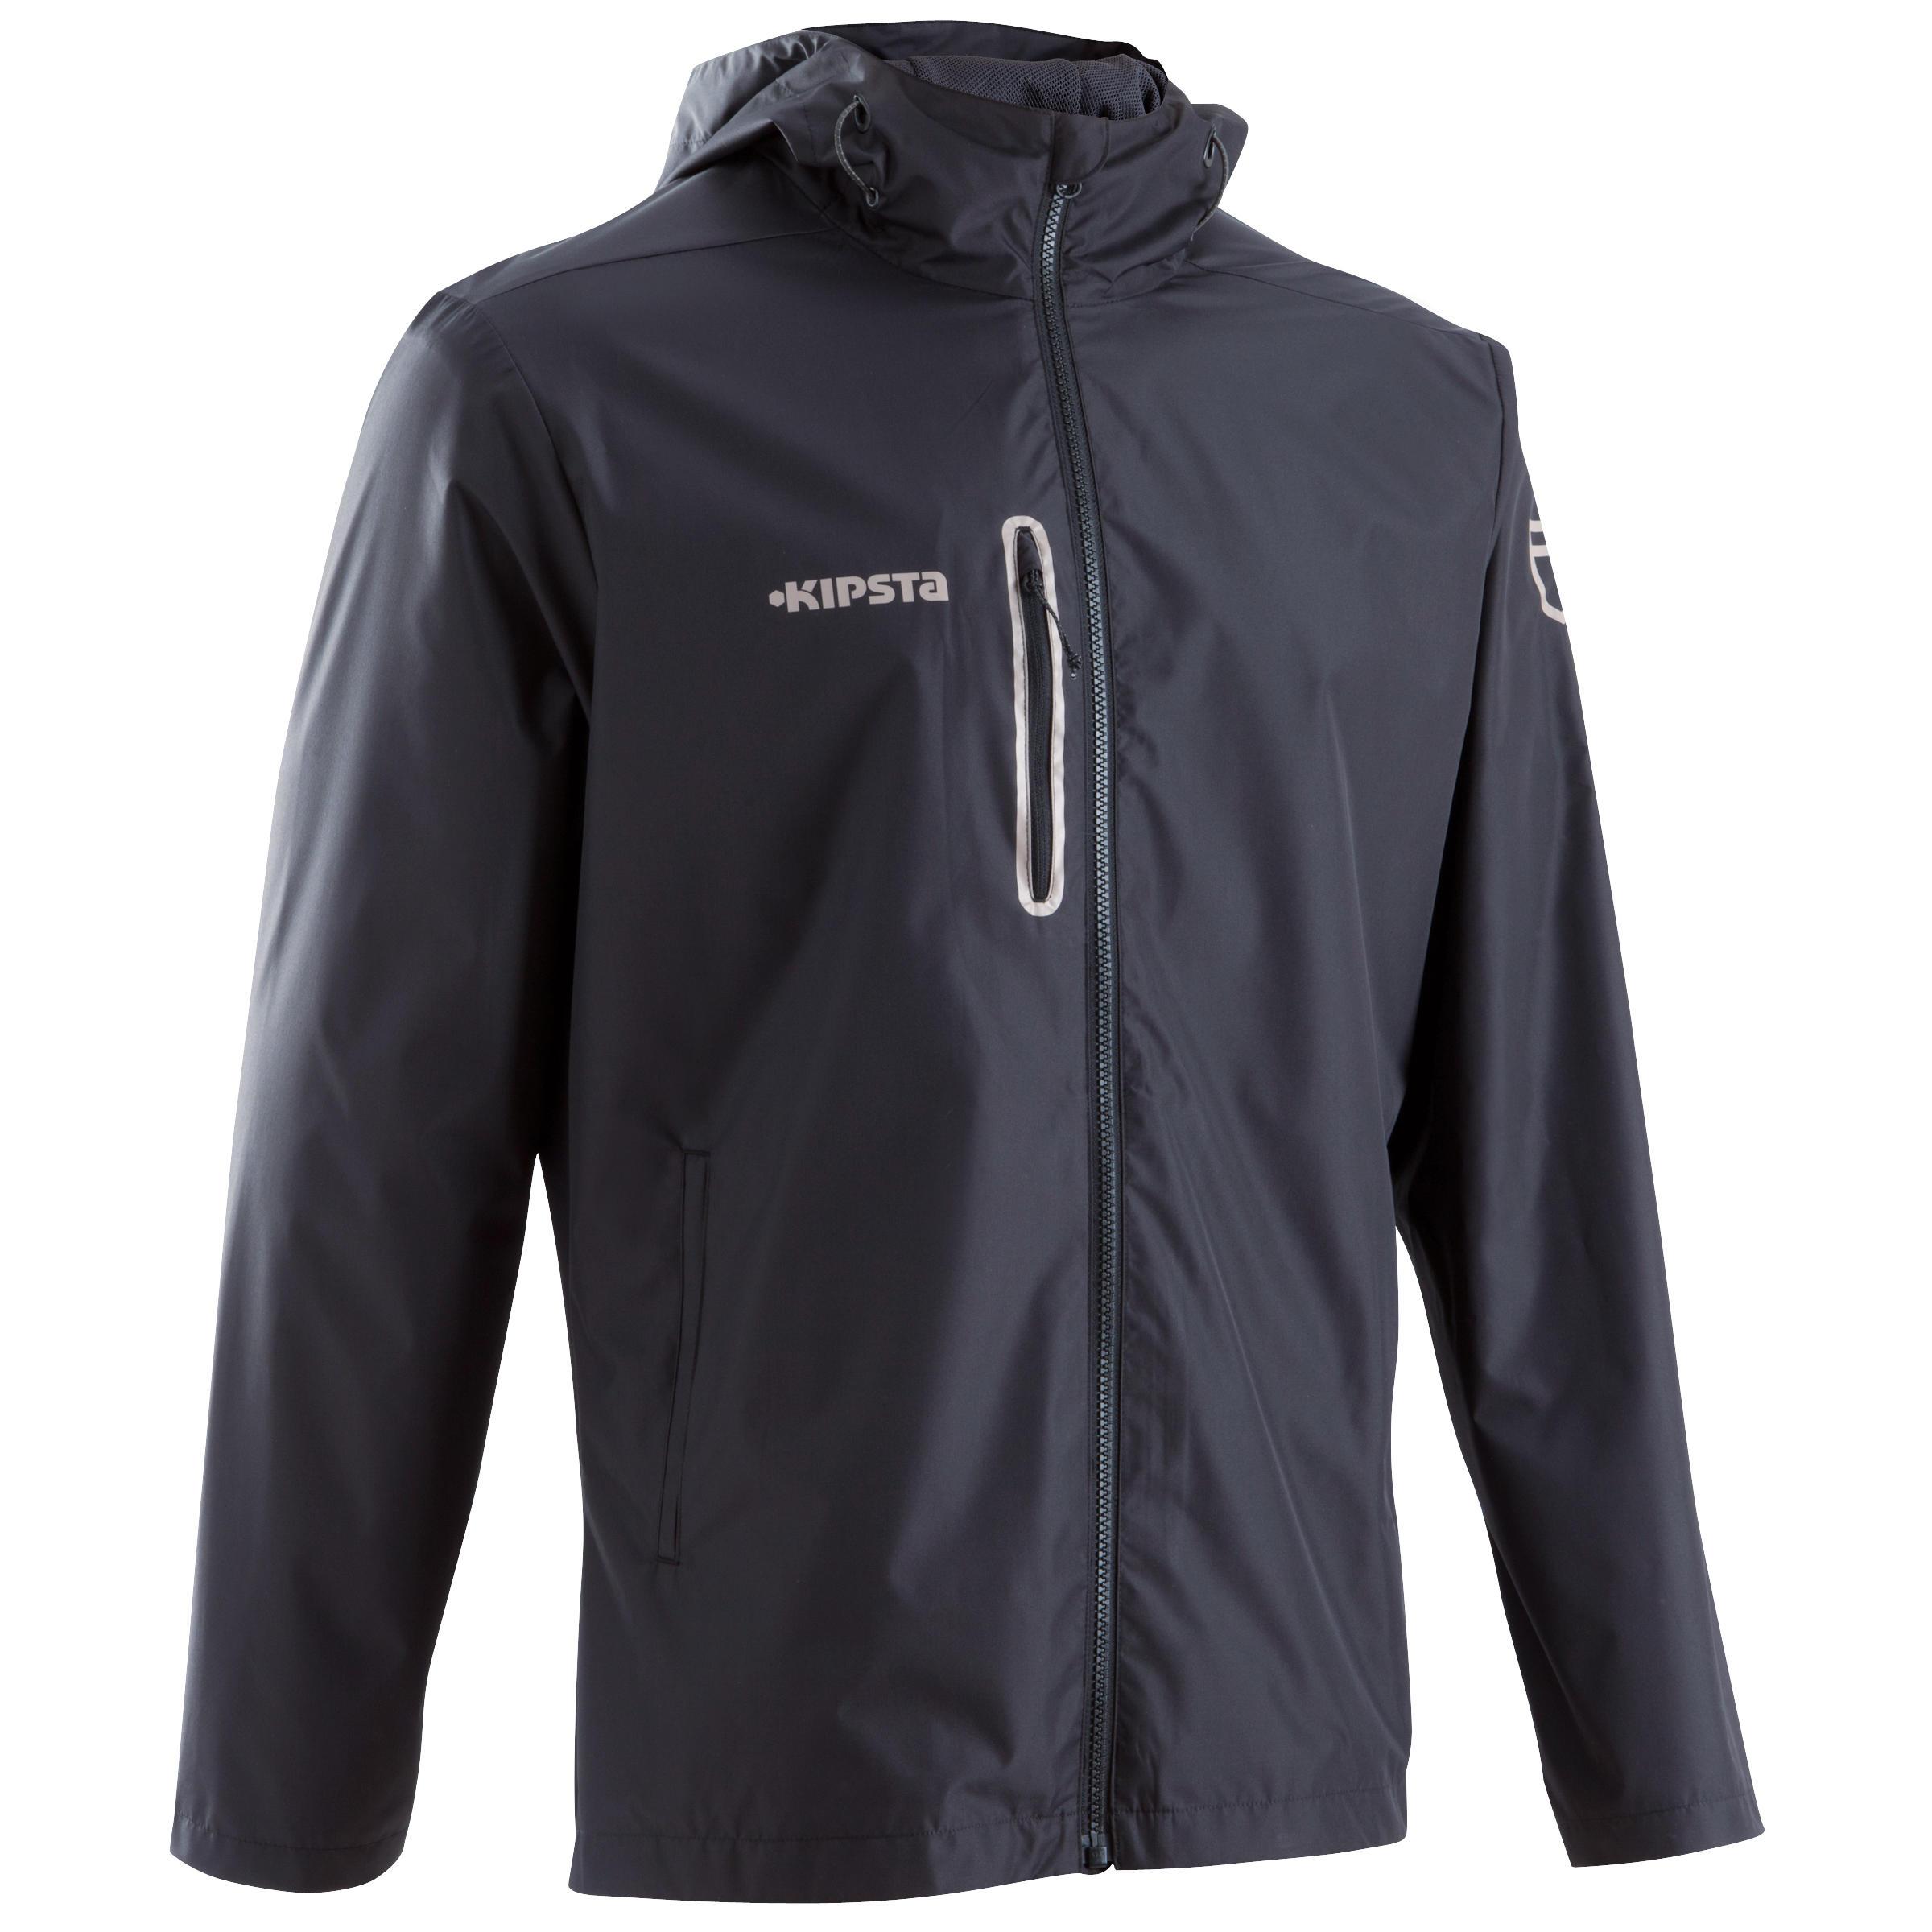 T500 Adult Waterproof Soccer Jacket - Black